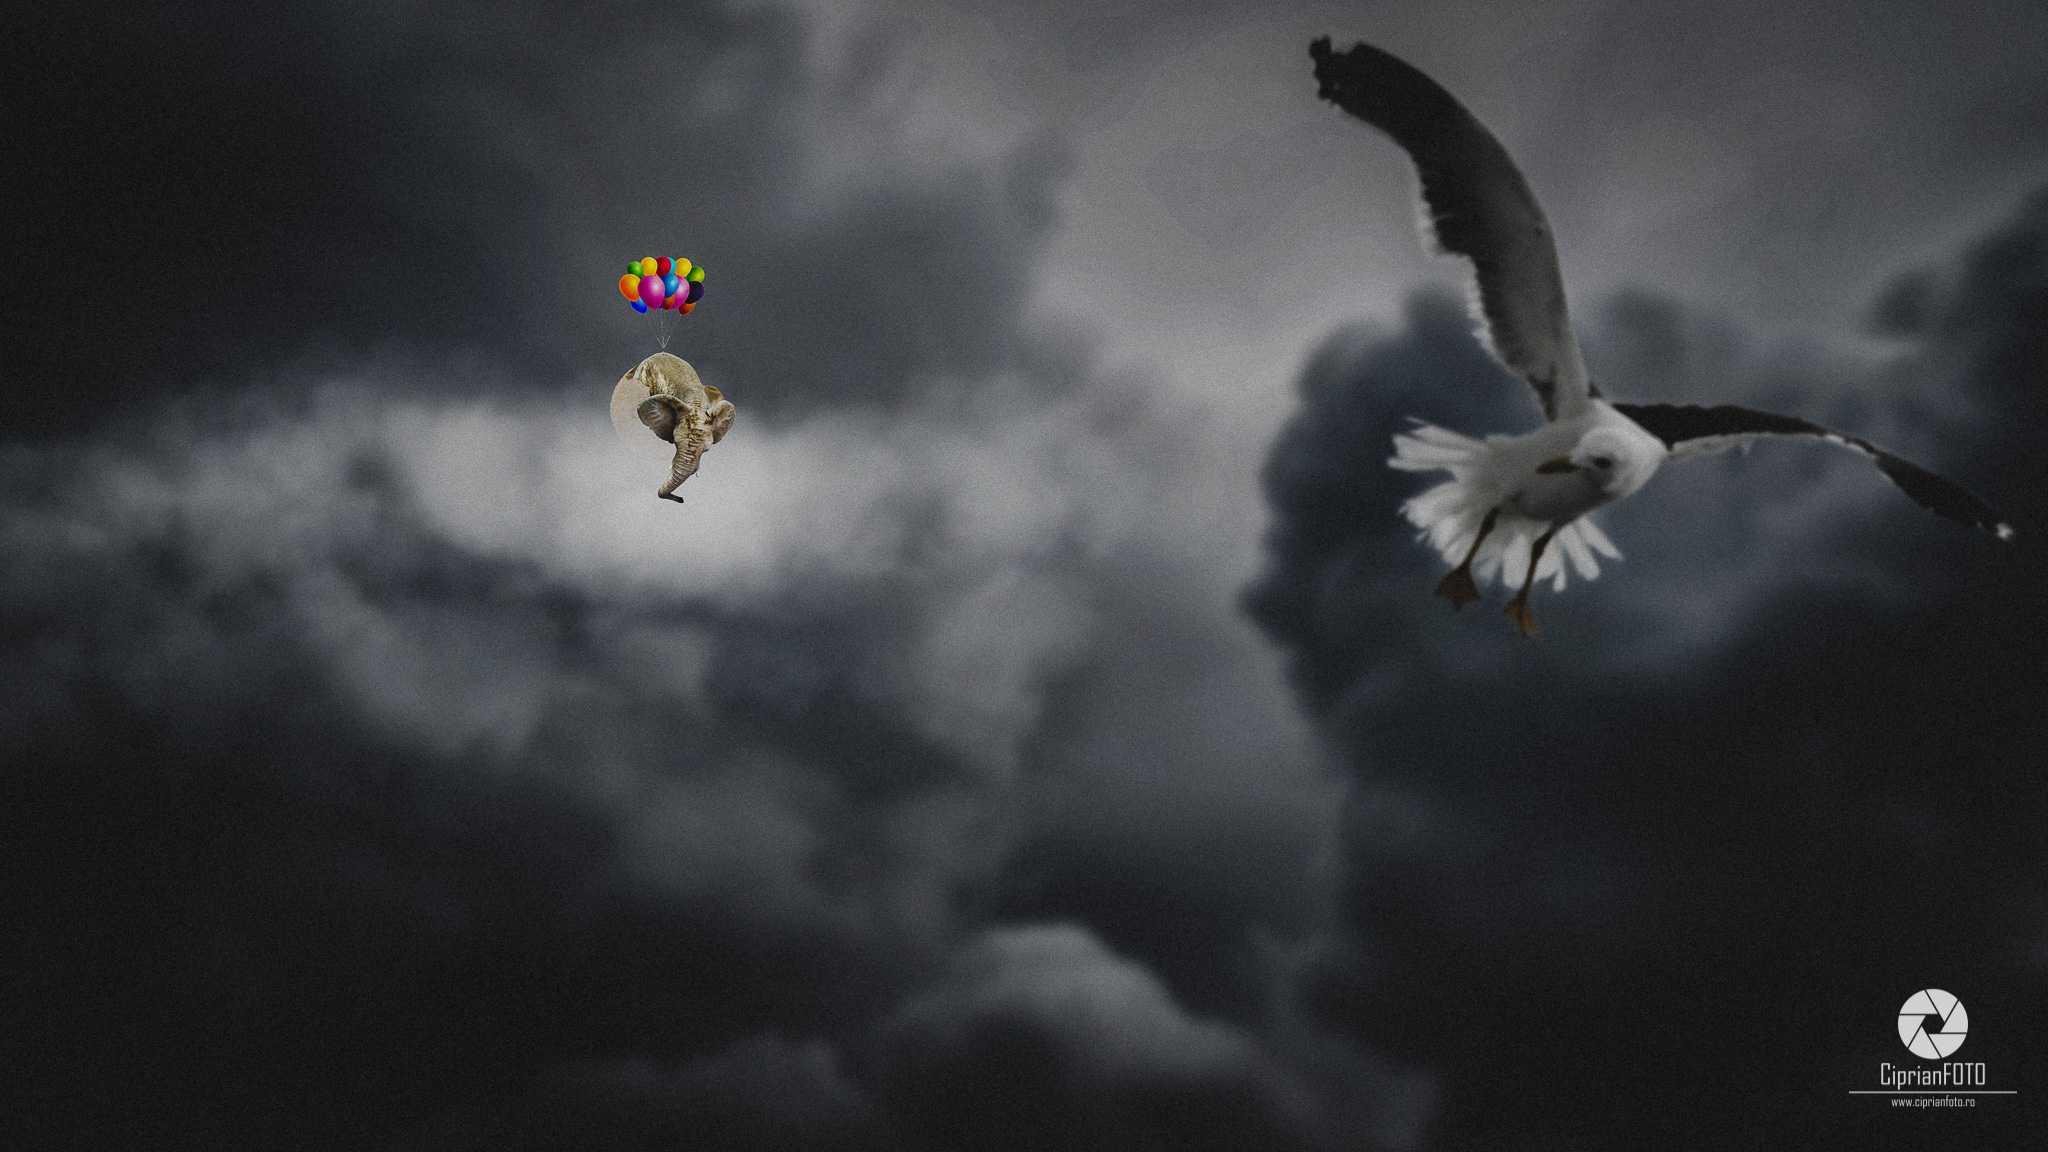 Flying_Elephant_Photoshop_Manipulation_Tutorial_CiprianFOTO